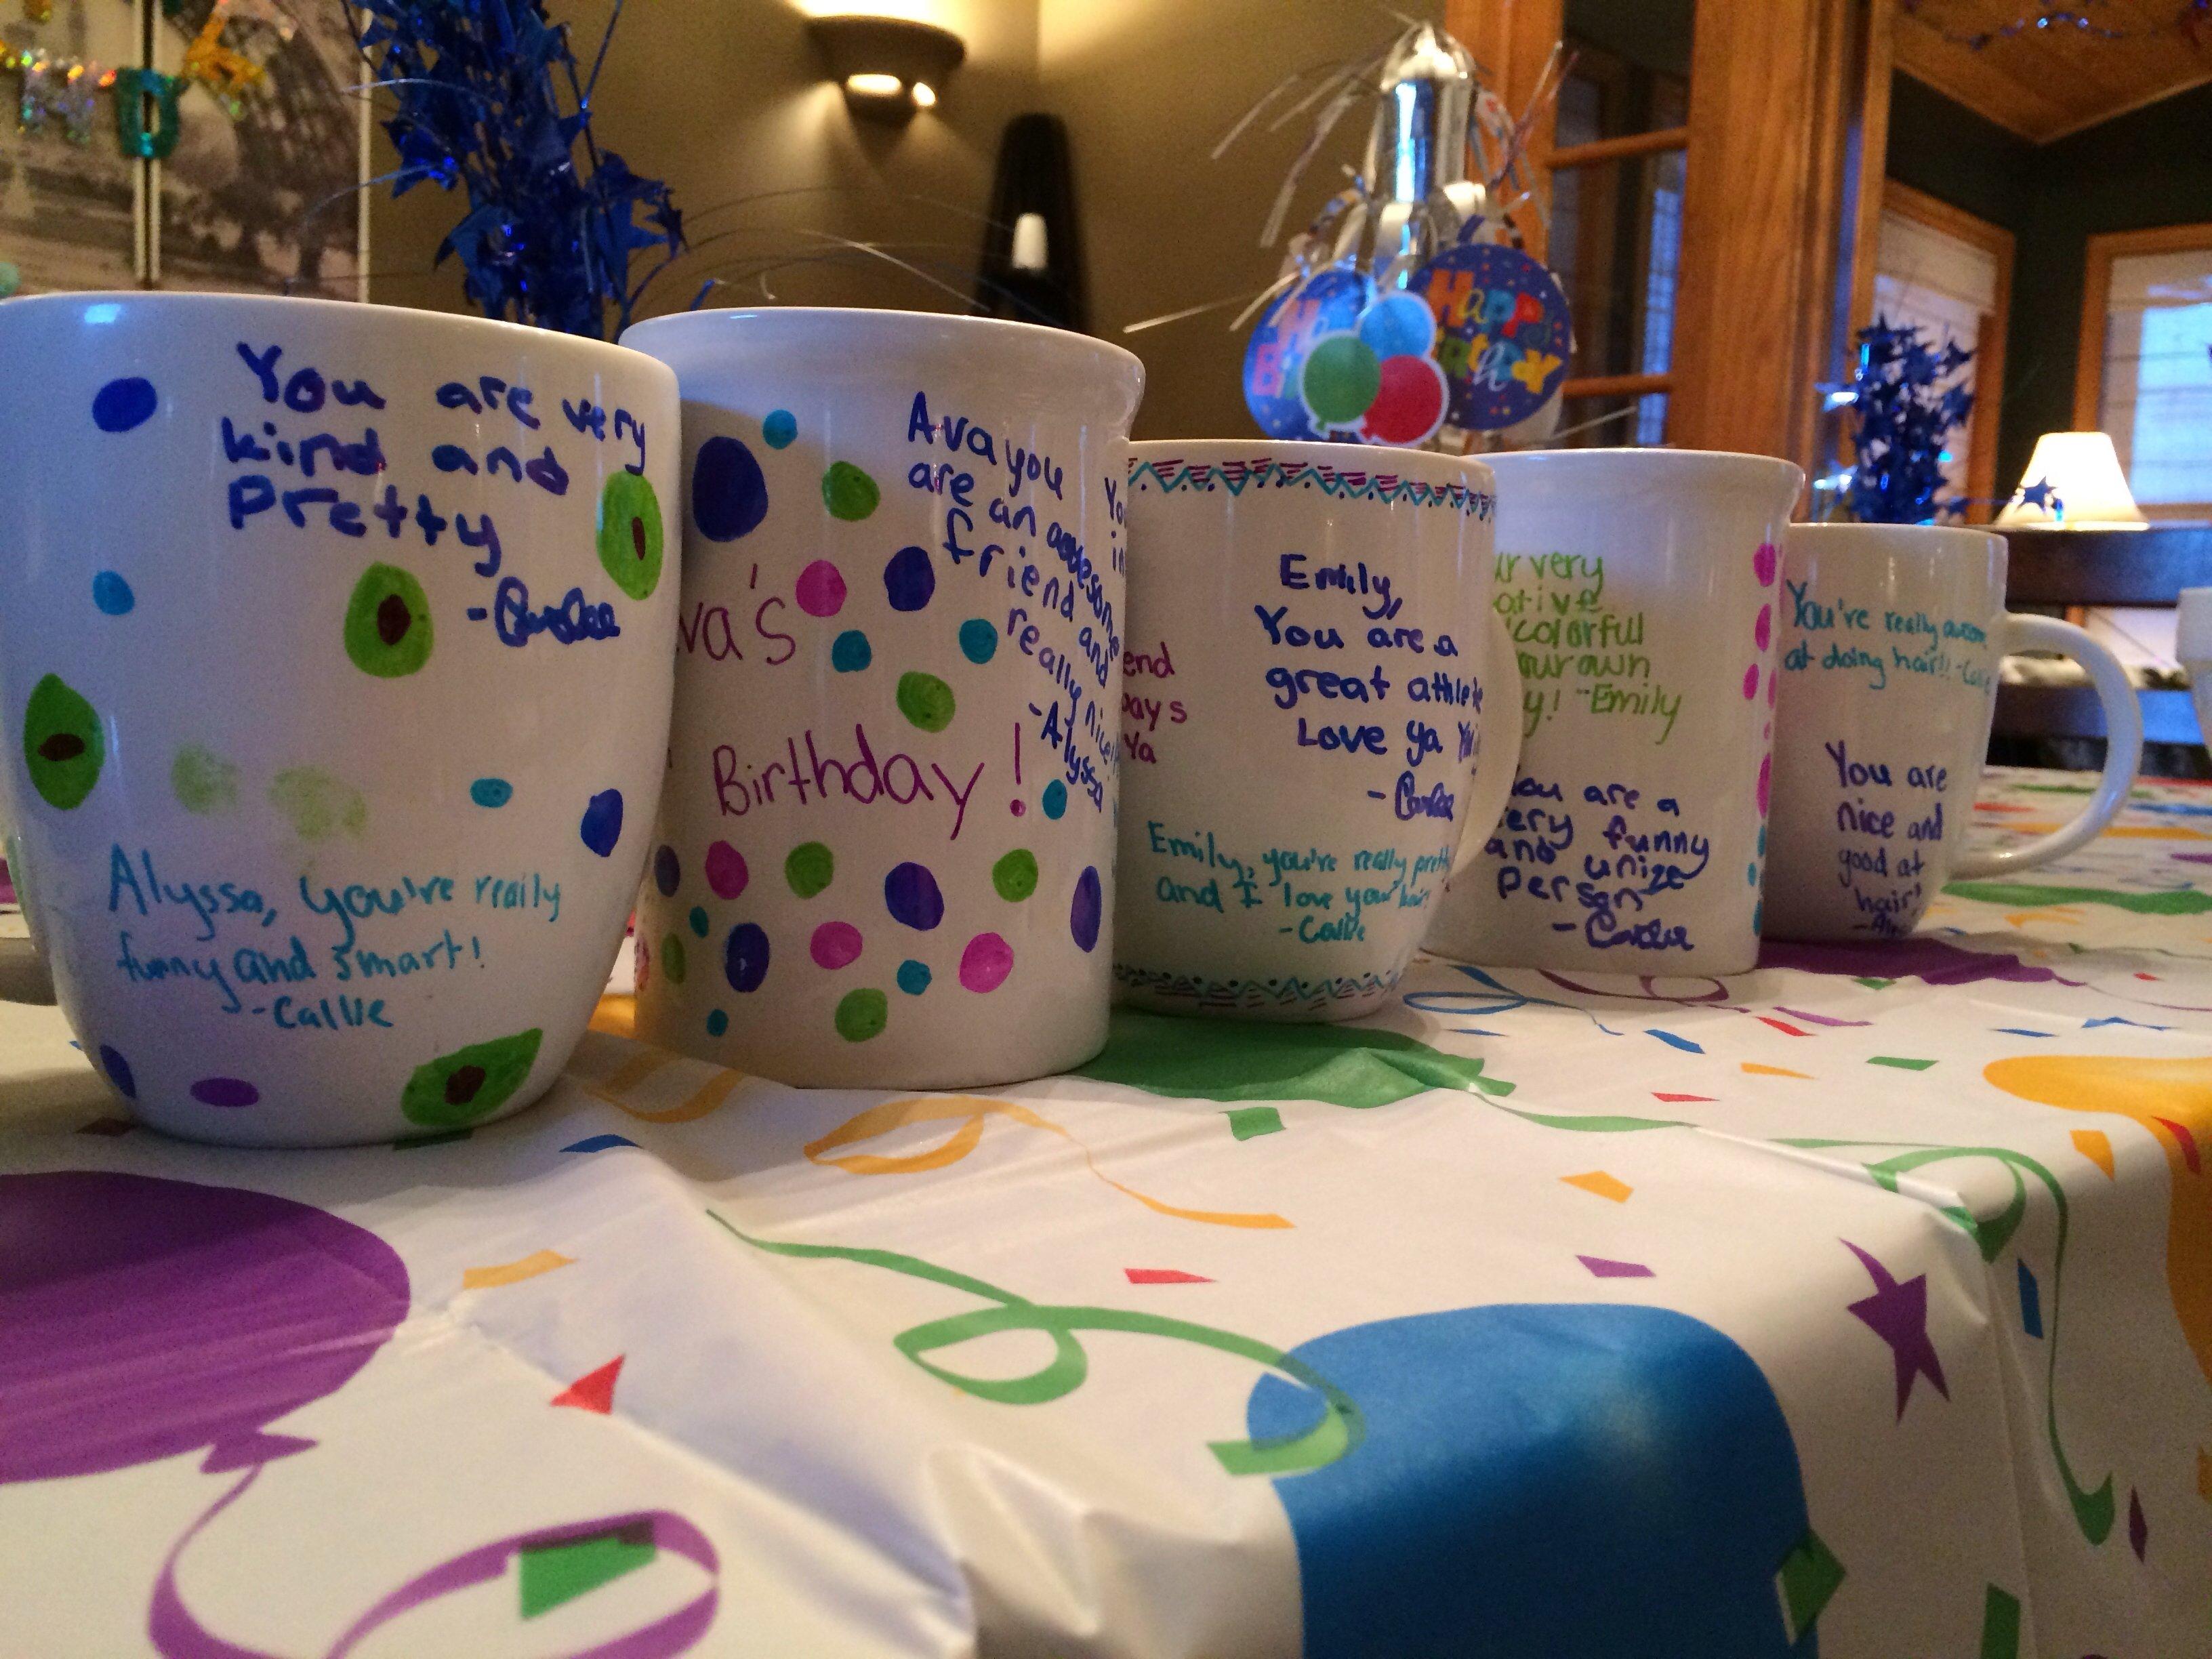 10 Great 12 Yr Old Birthday Ideas slumber party invitation ideas homemade sharpie mugs birthday fun 3 2021